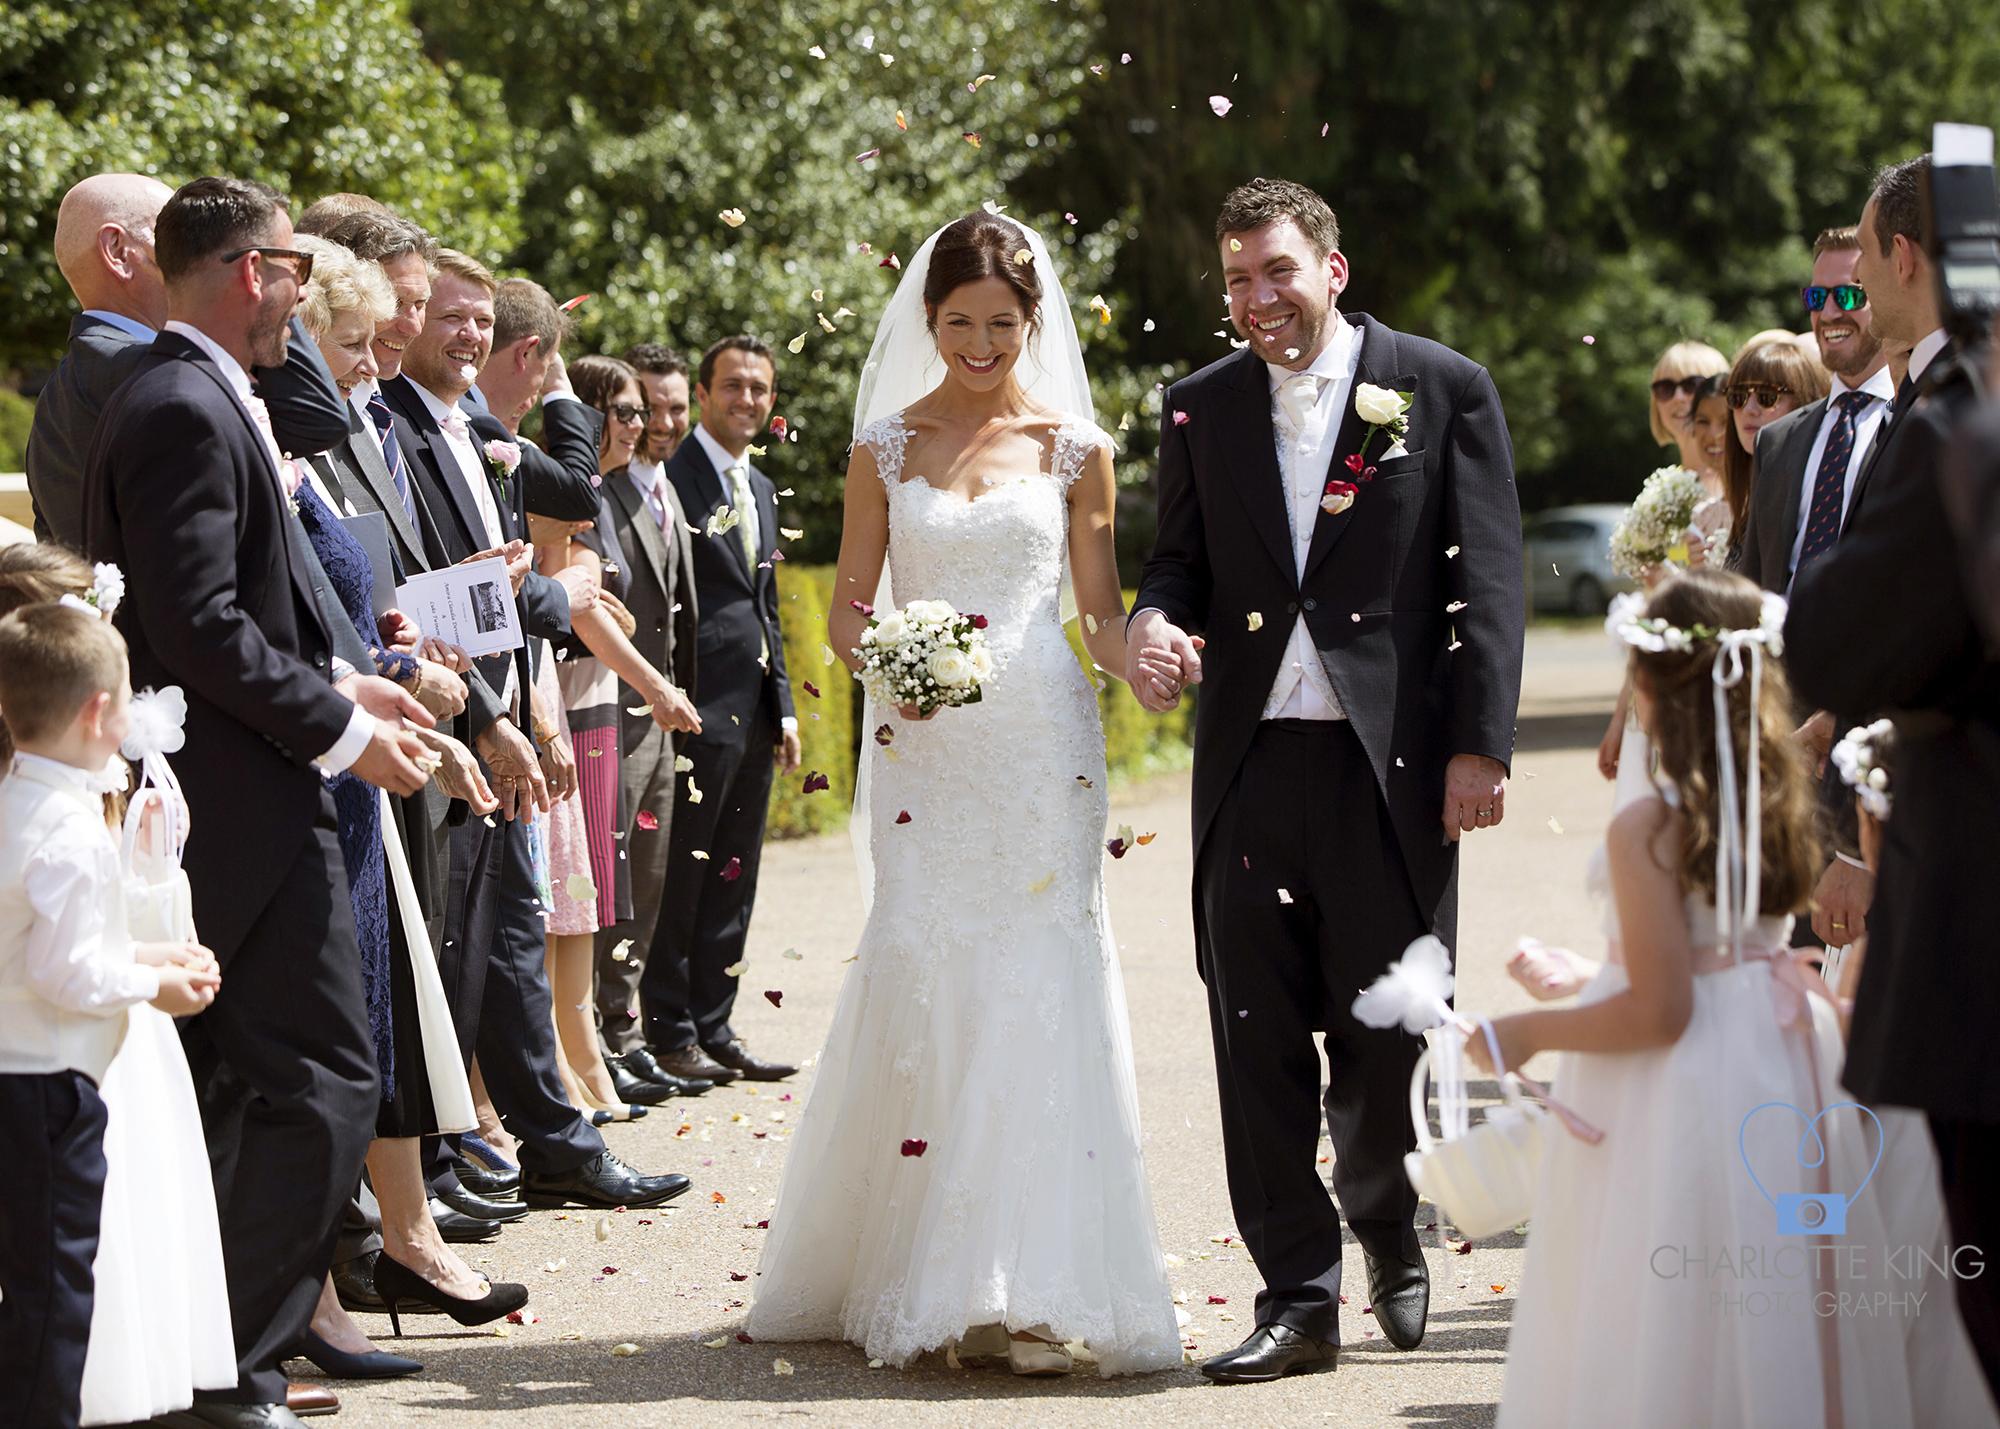 Woldingham-school-wedding-charlotte-king-photography (89)